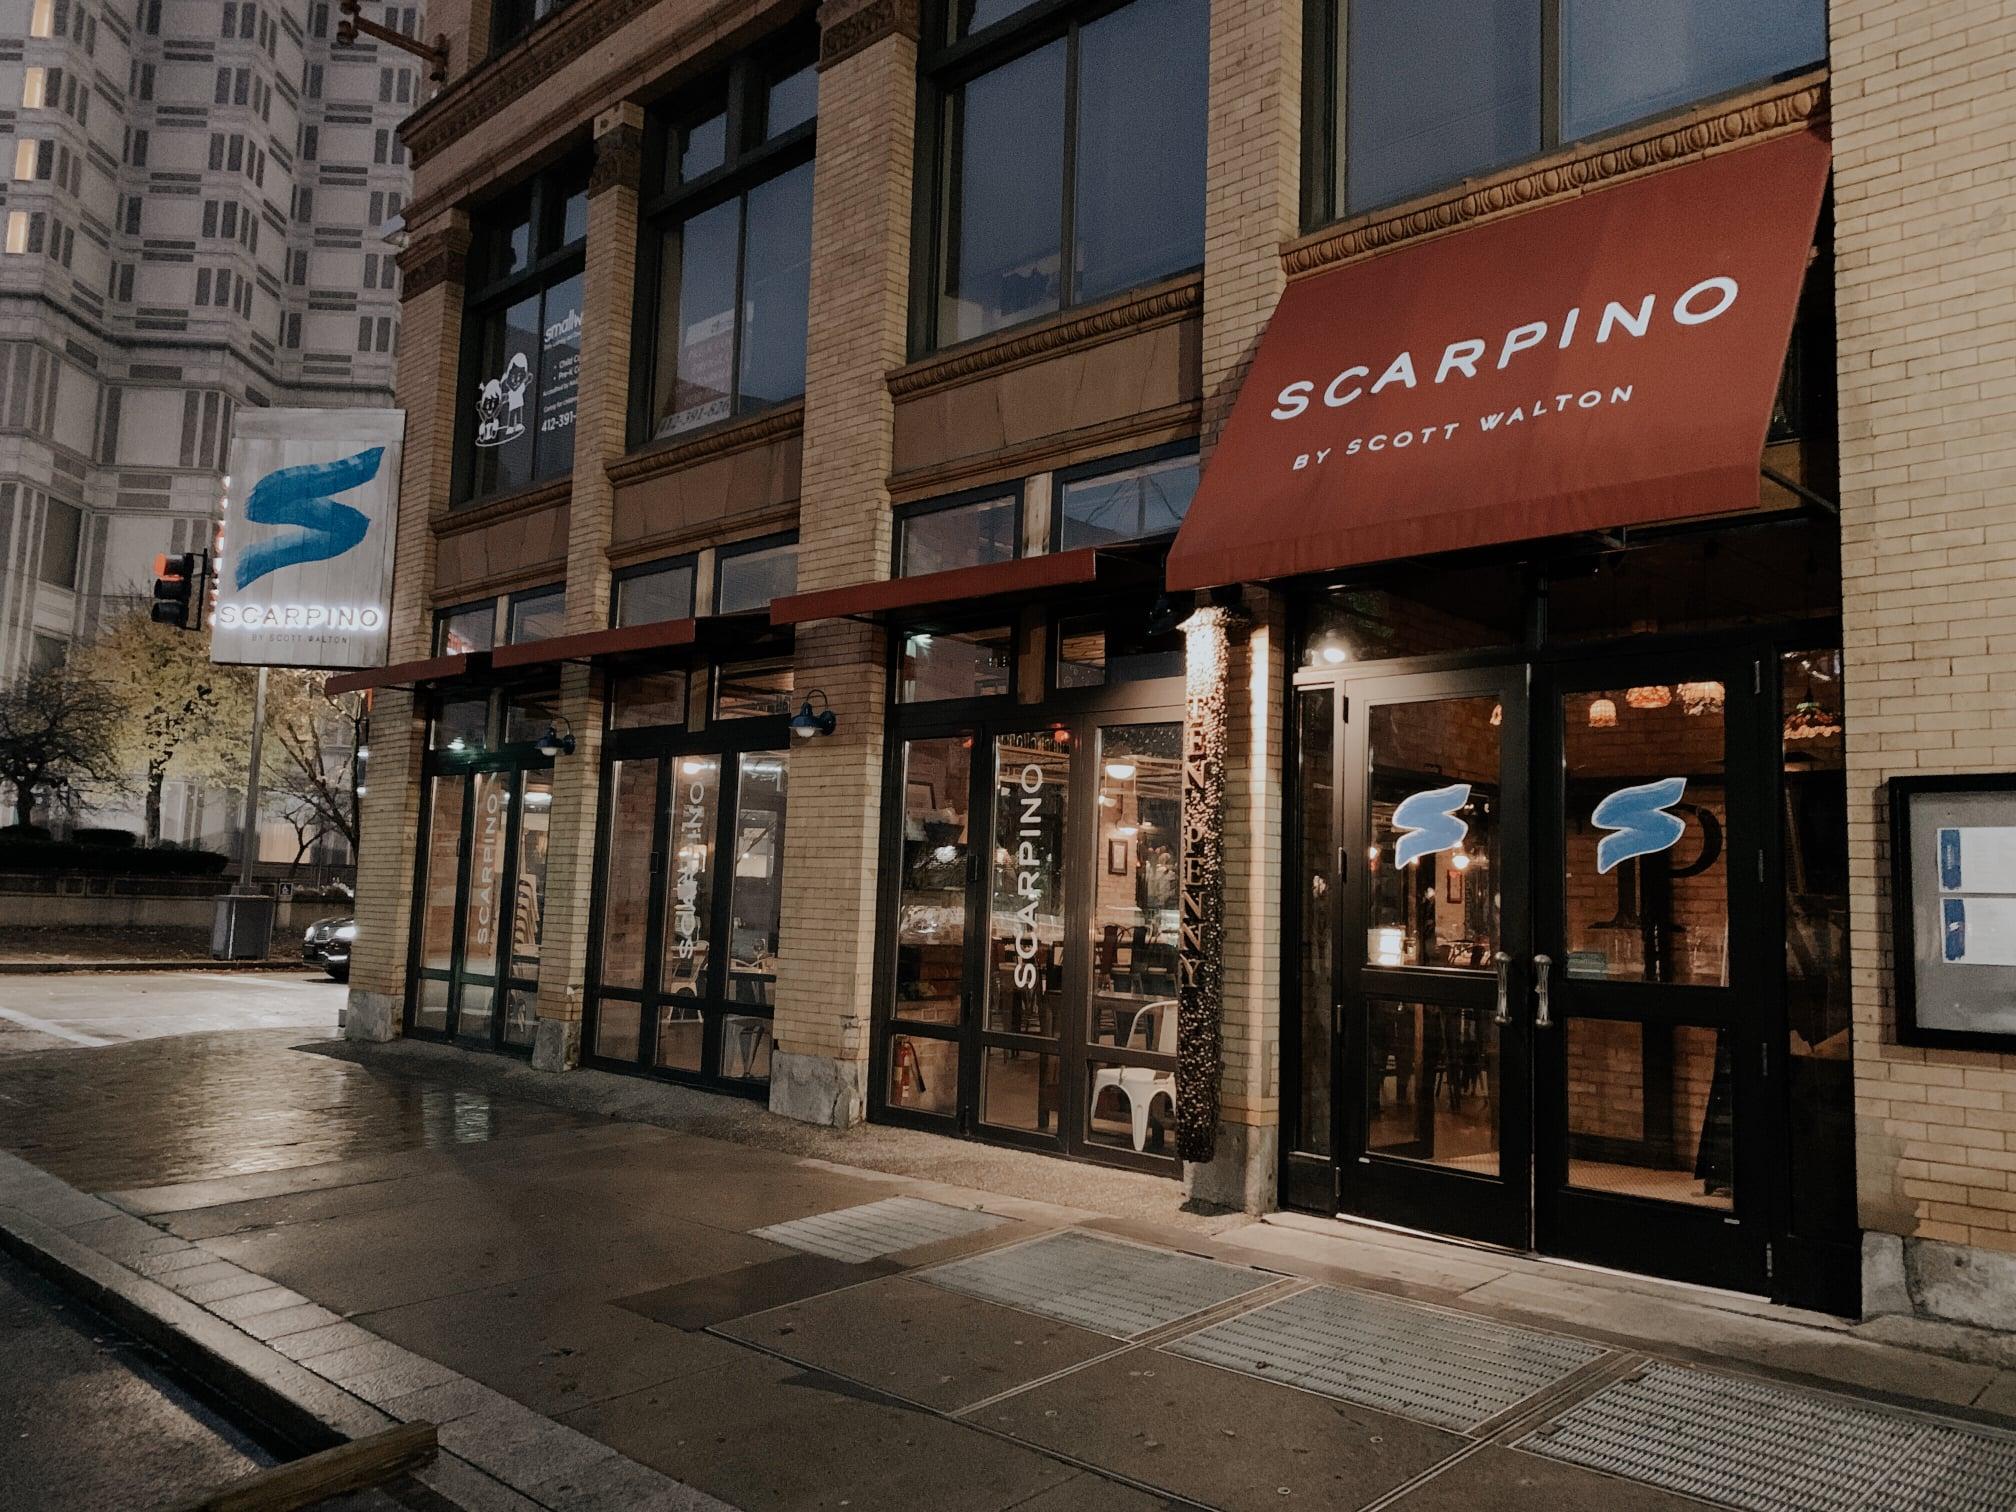 Scarpino, The Newest Italian Restaurant In Pittsburgh, Is Bucket List-Worthy